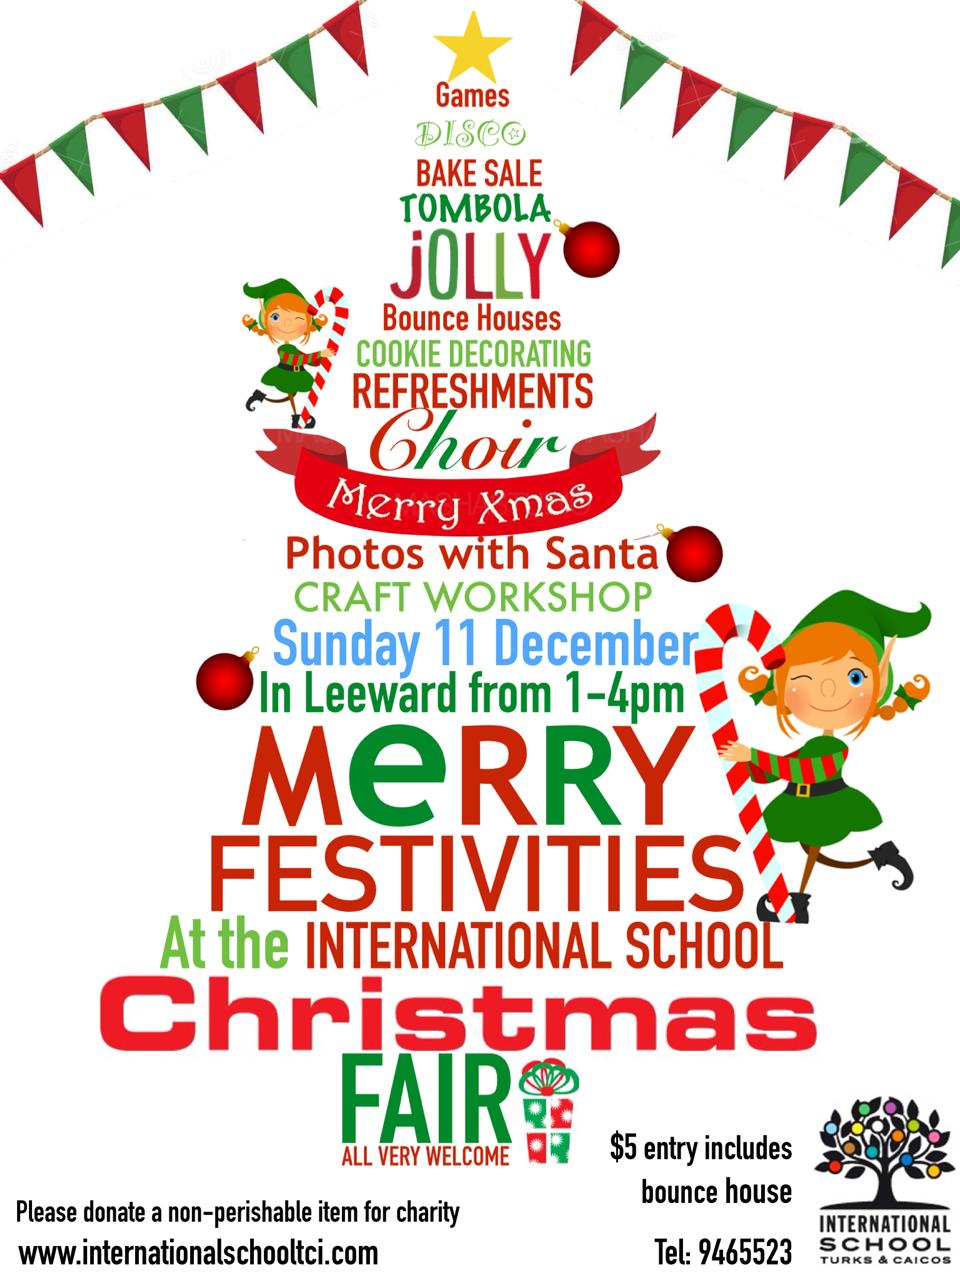 International School Christmas Fair 2016 - Christmas Fayre PNG